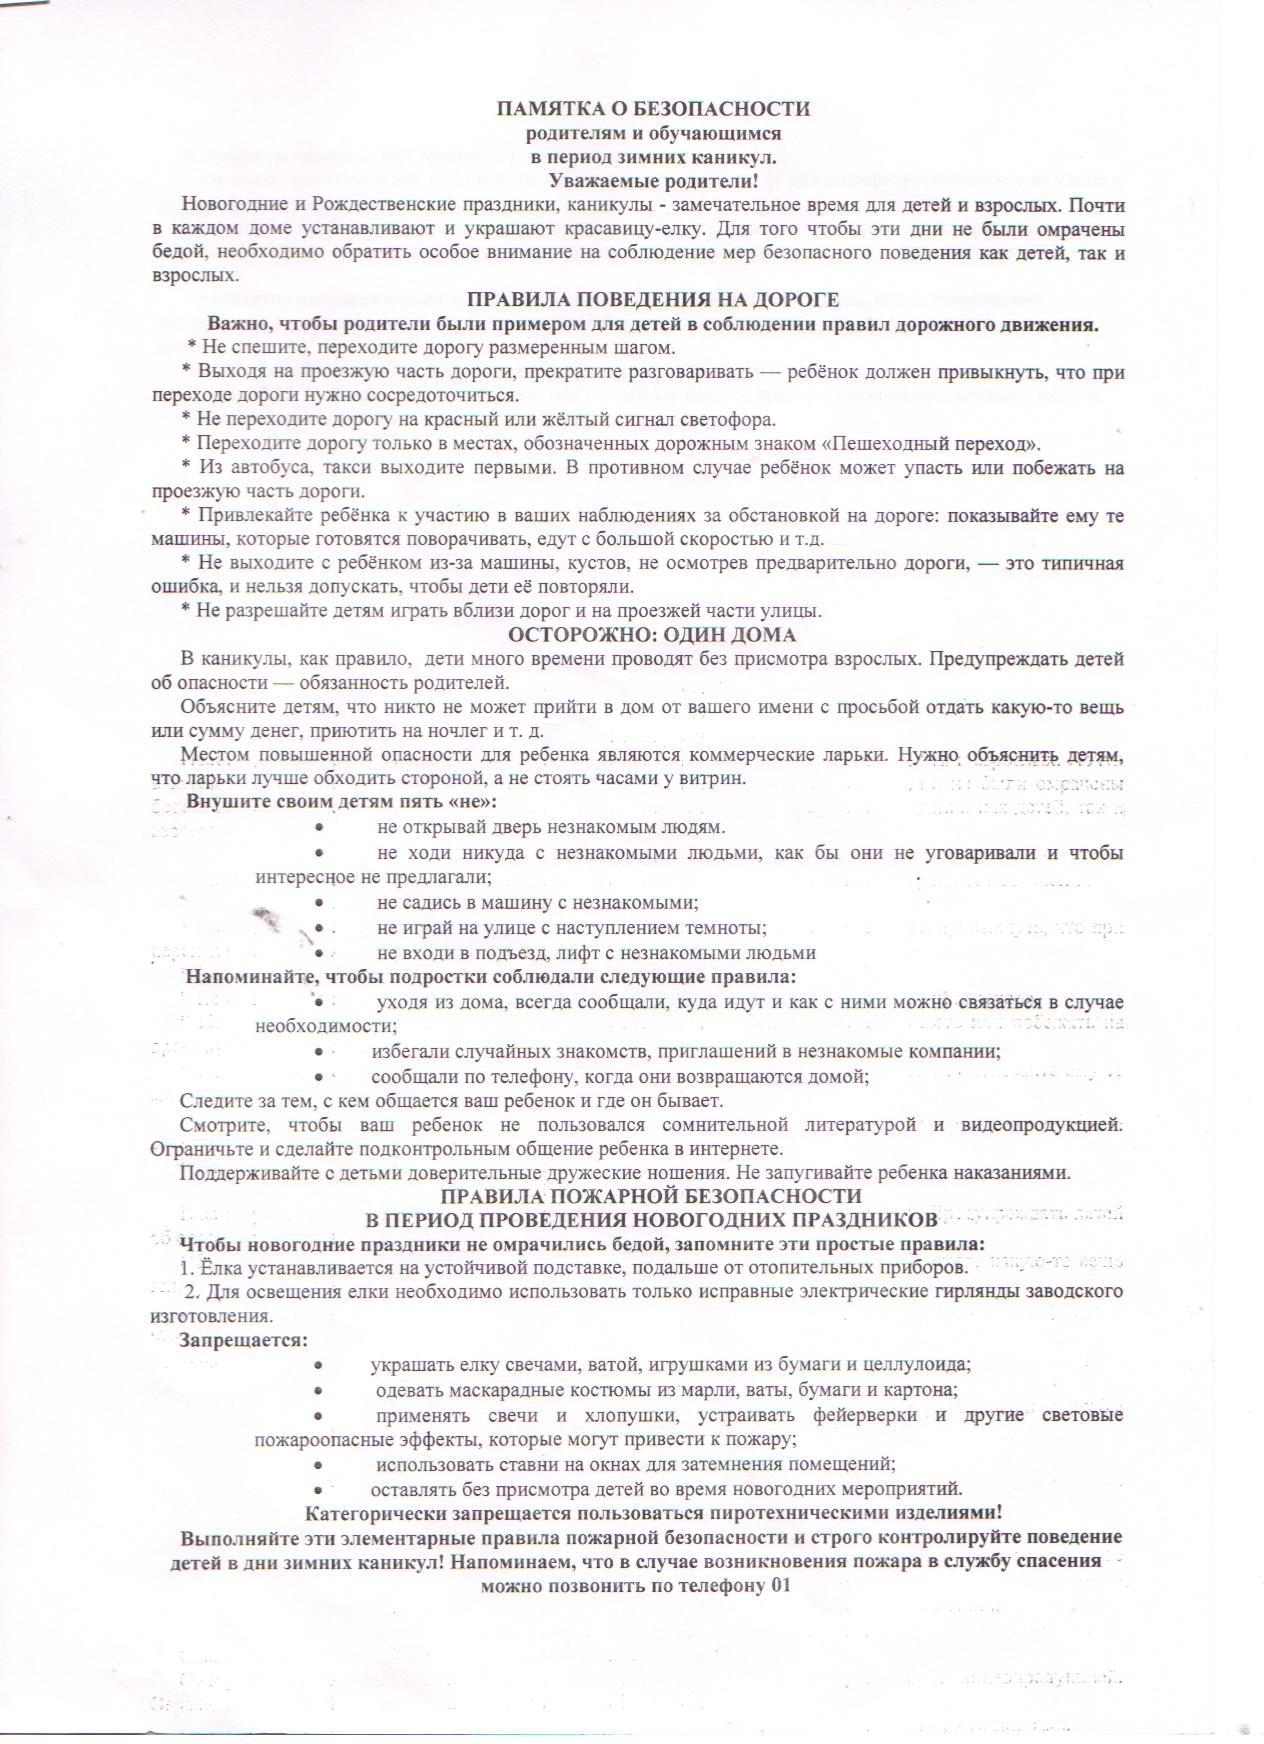 http://lermds2.ucoz.ru/bezopasnost/pamjatka.jpg